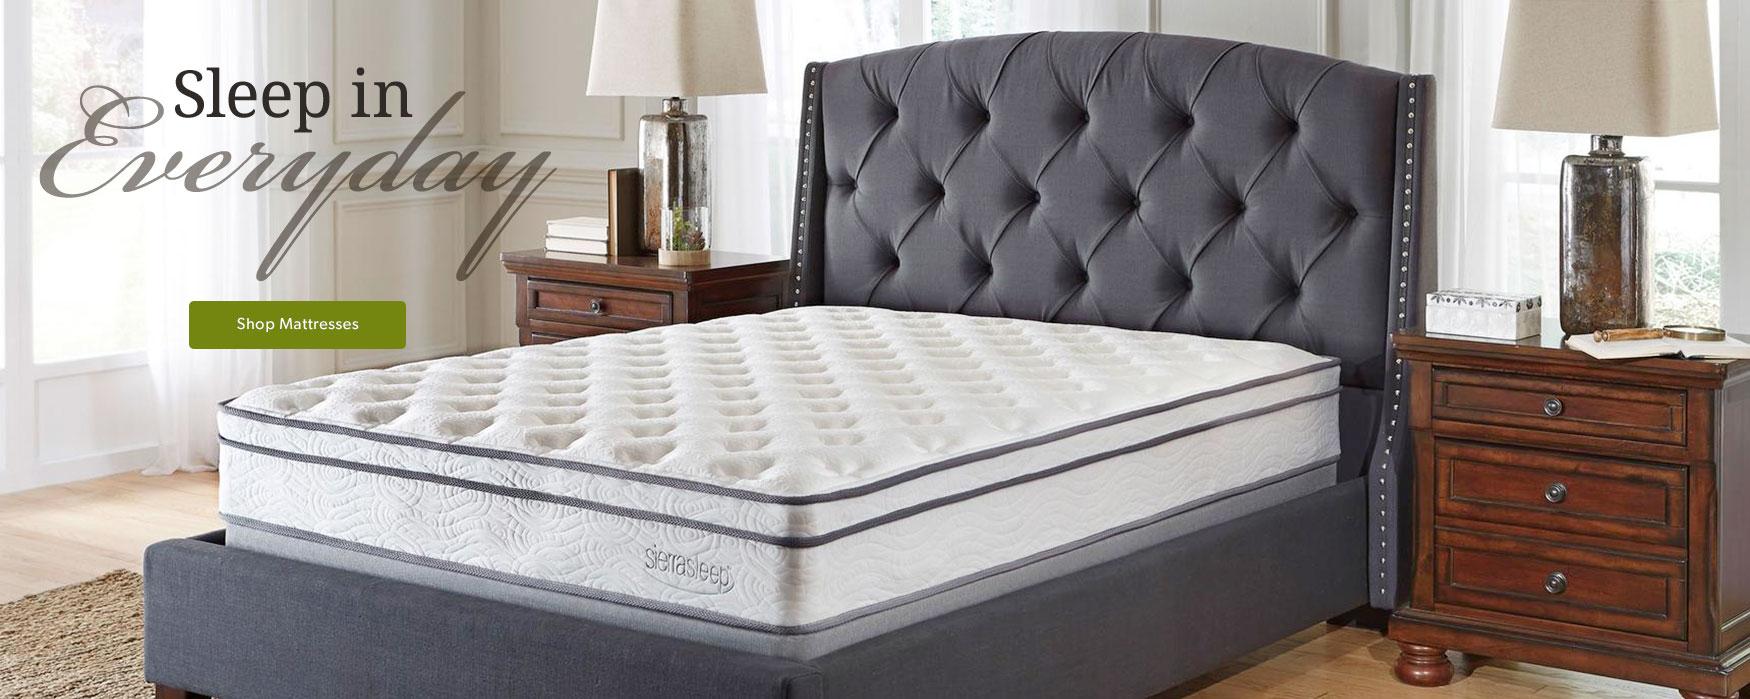 furniture and mattress warehouse